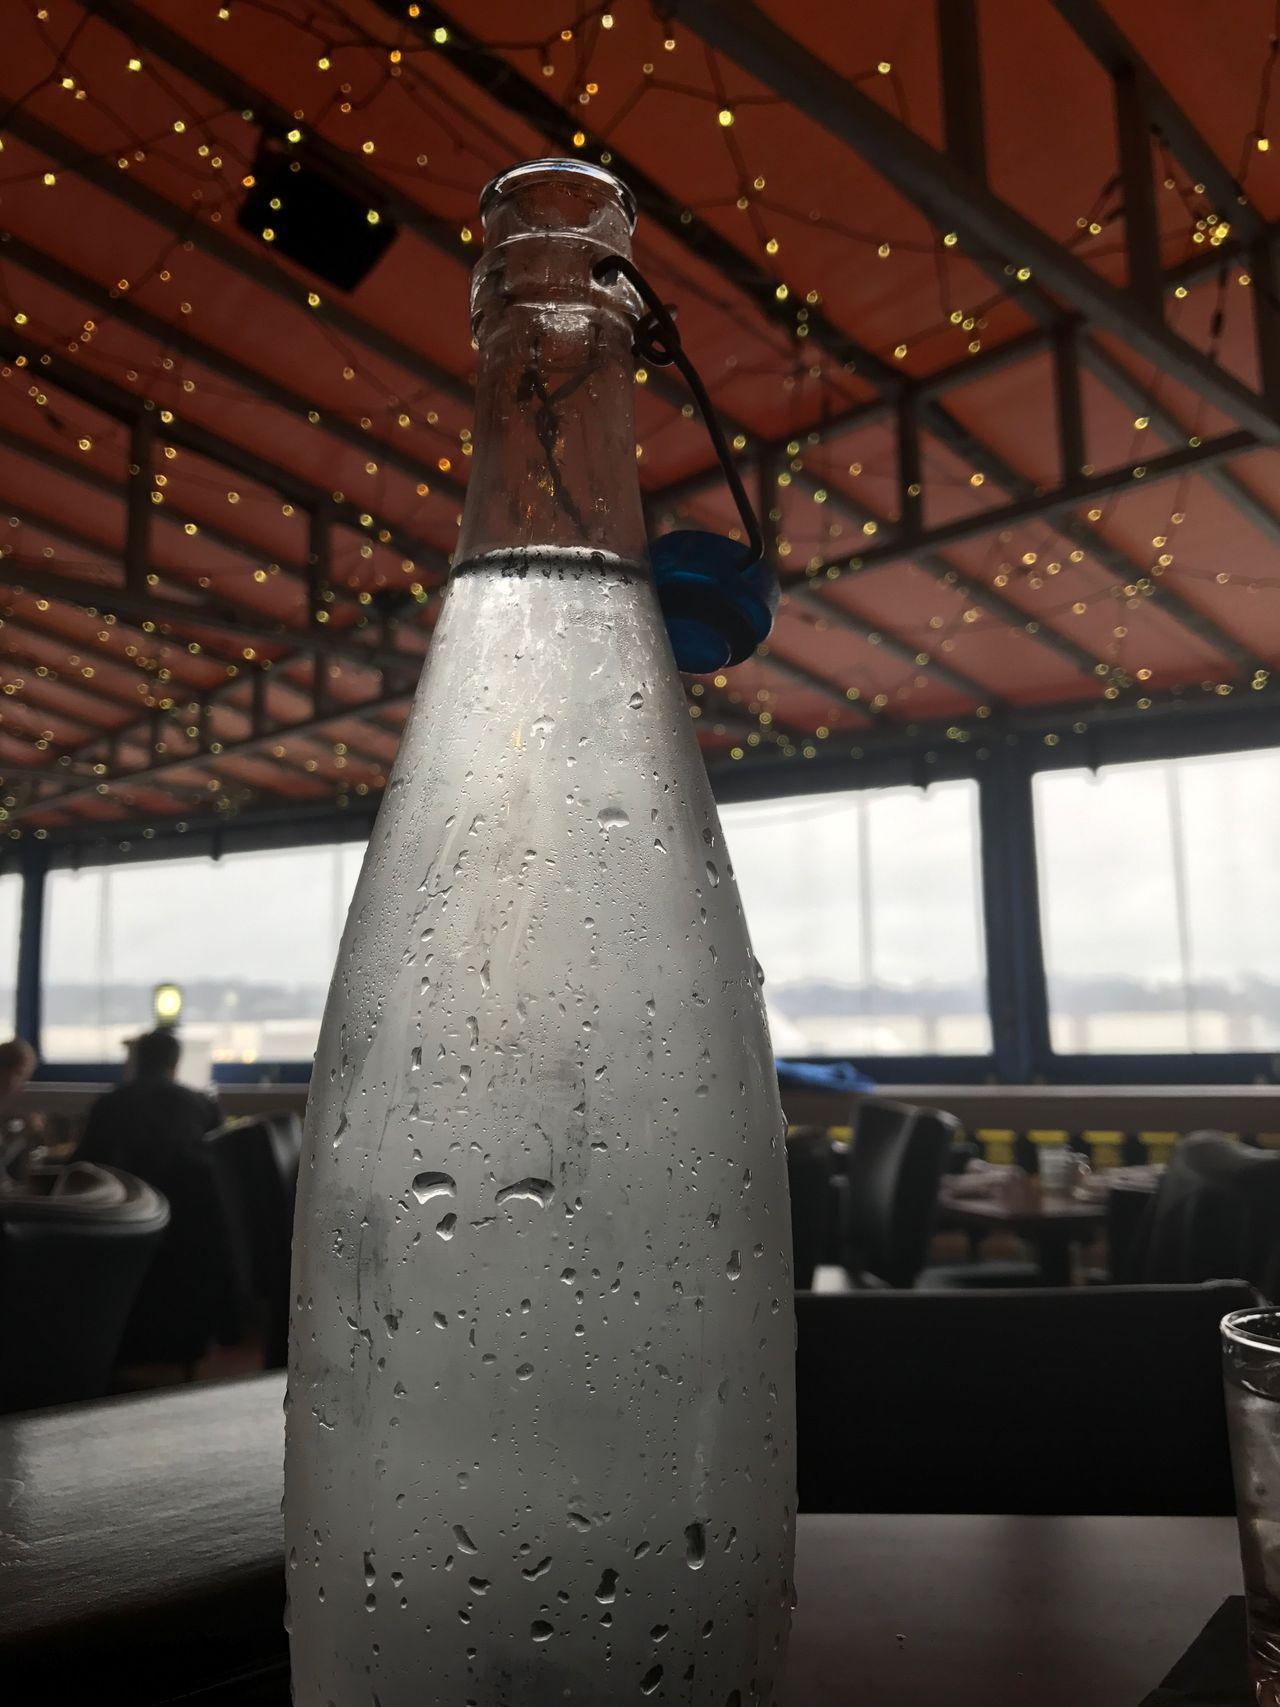 Water Bottle Drink Photooftheday #2instagood #featuremeinstagood #ig_exquisite #top_masters #jj #publicimage #igmasters #hot_shotz #allshots_ #jj_daily #all_shots #pro_shooters #instaaaaah #instamood #bestoftheday #icatching #tweegram #igdaily #iphonesia